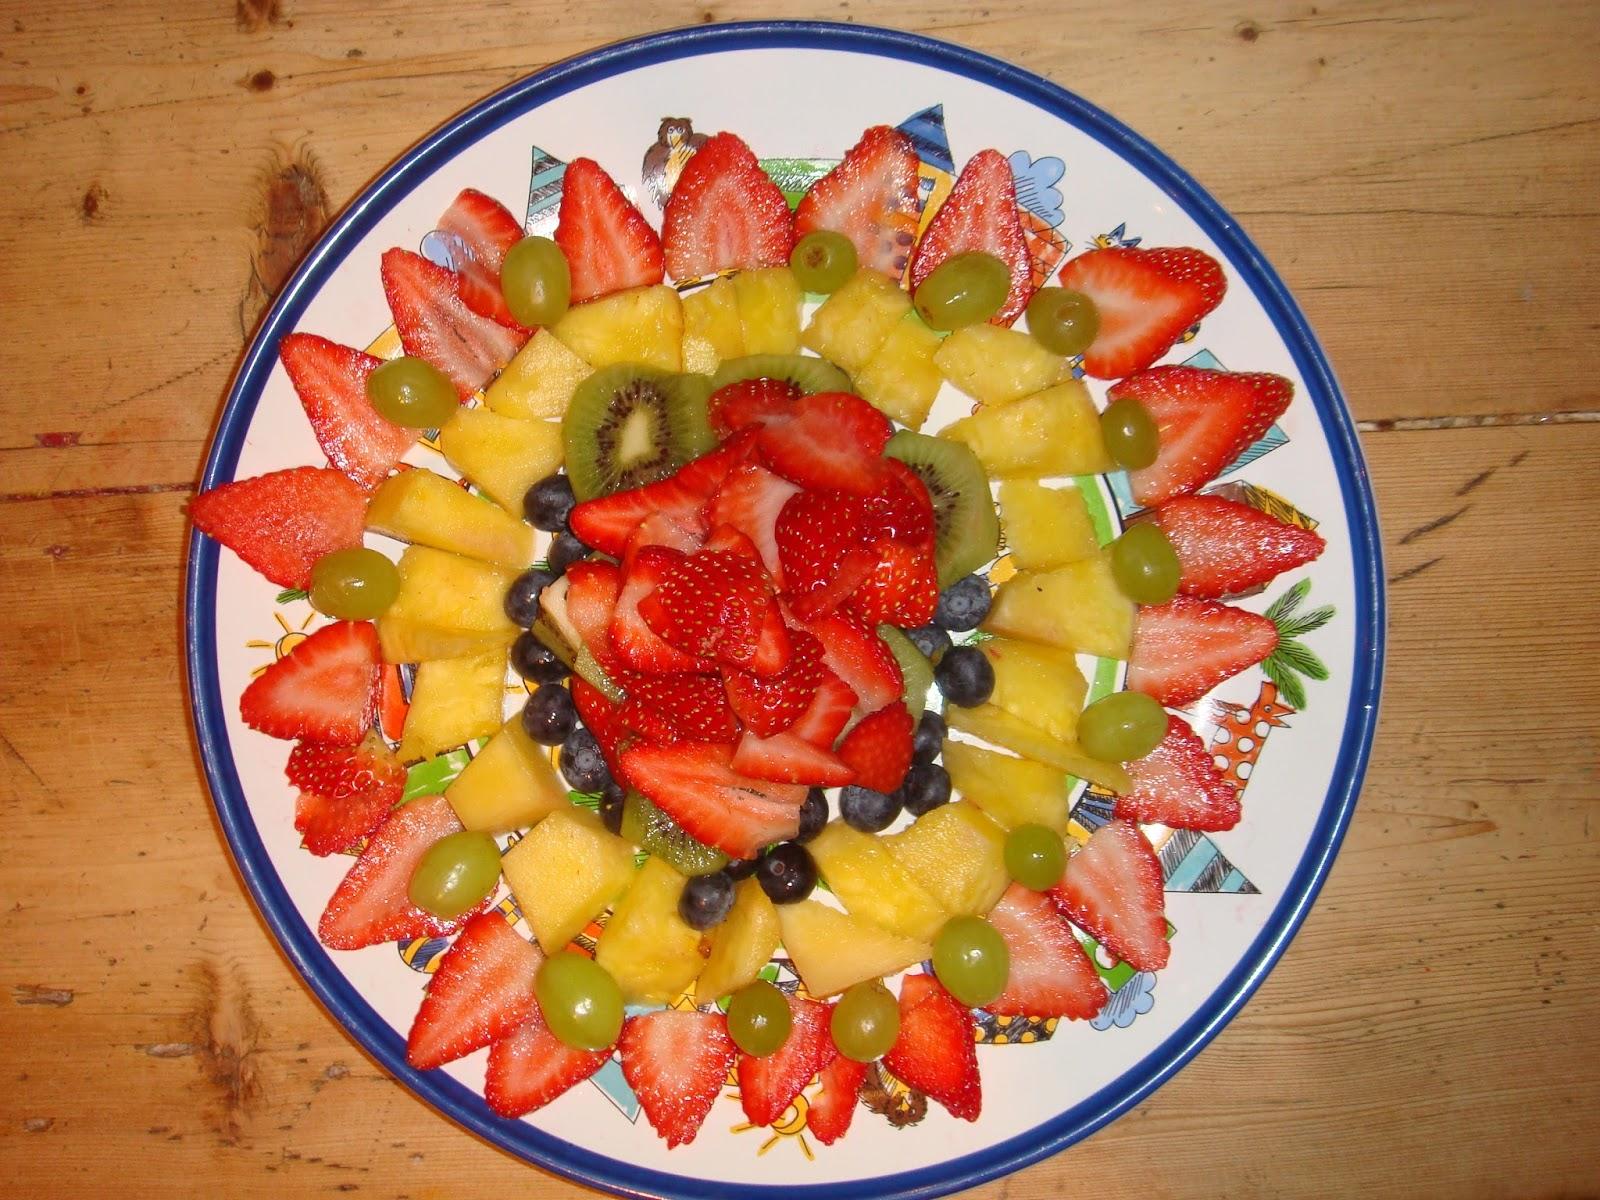 Fruit salad decoration for baby shower - YouTube